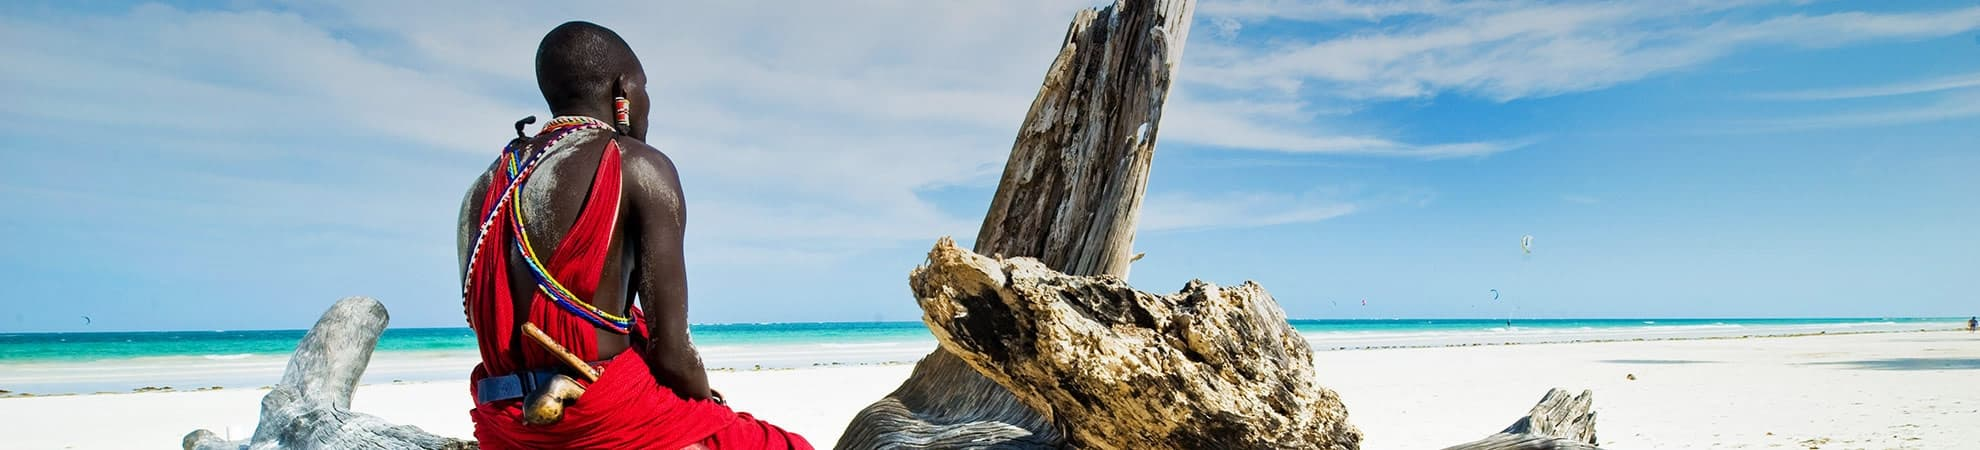 Voyage Le littoral - Kenya